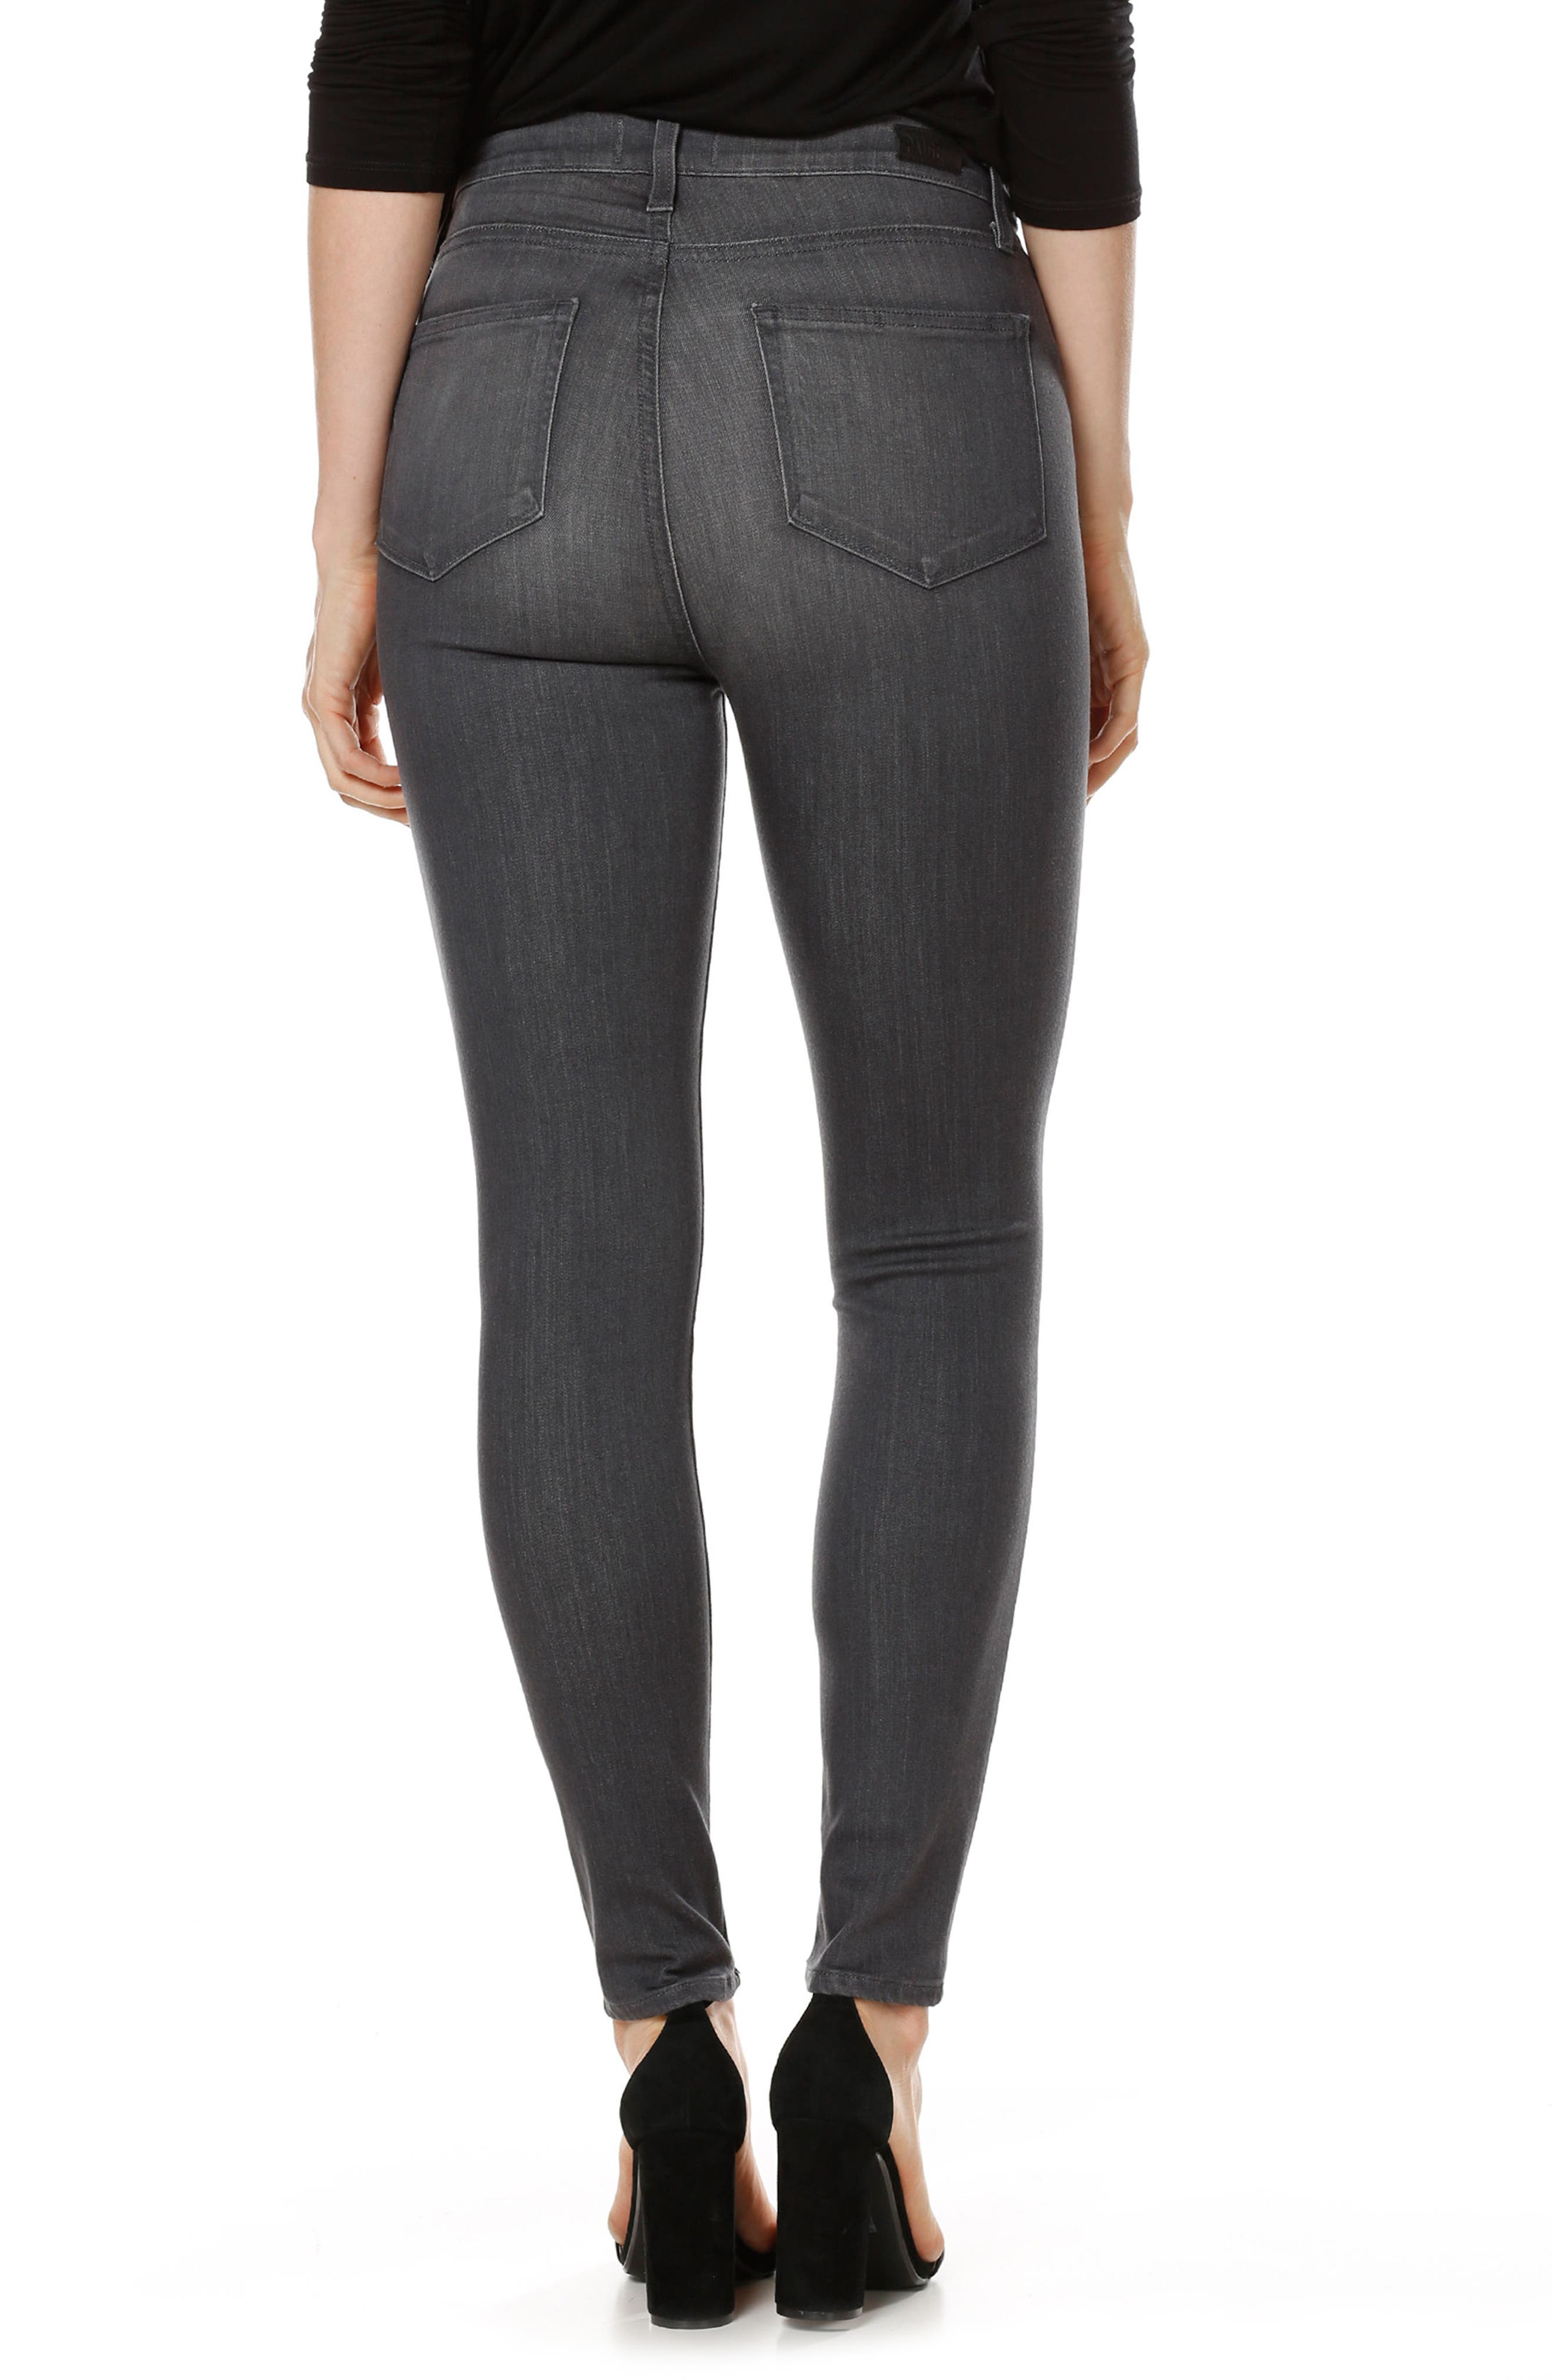 Alternate Image 2  - PAIGE Transcend - Margot High Waist Ankle Ultra Skinny Jeans (Summit Grey)